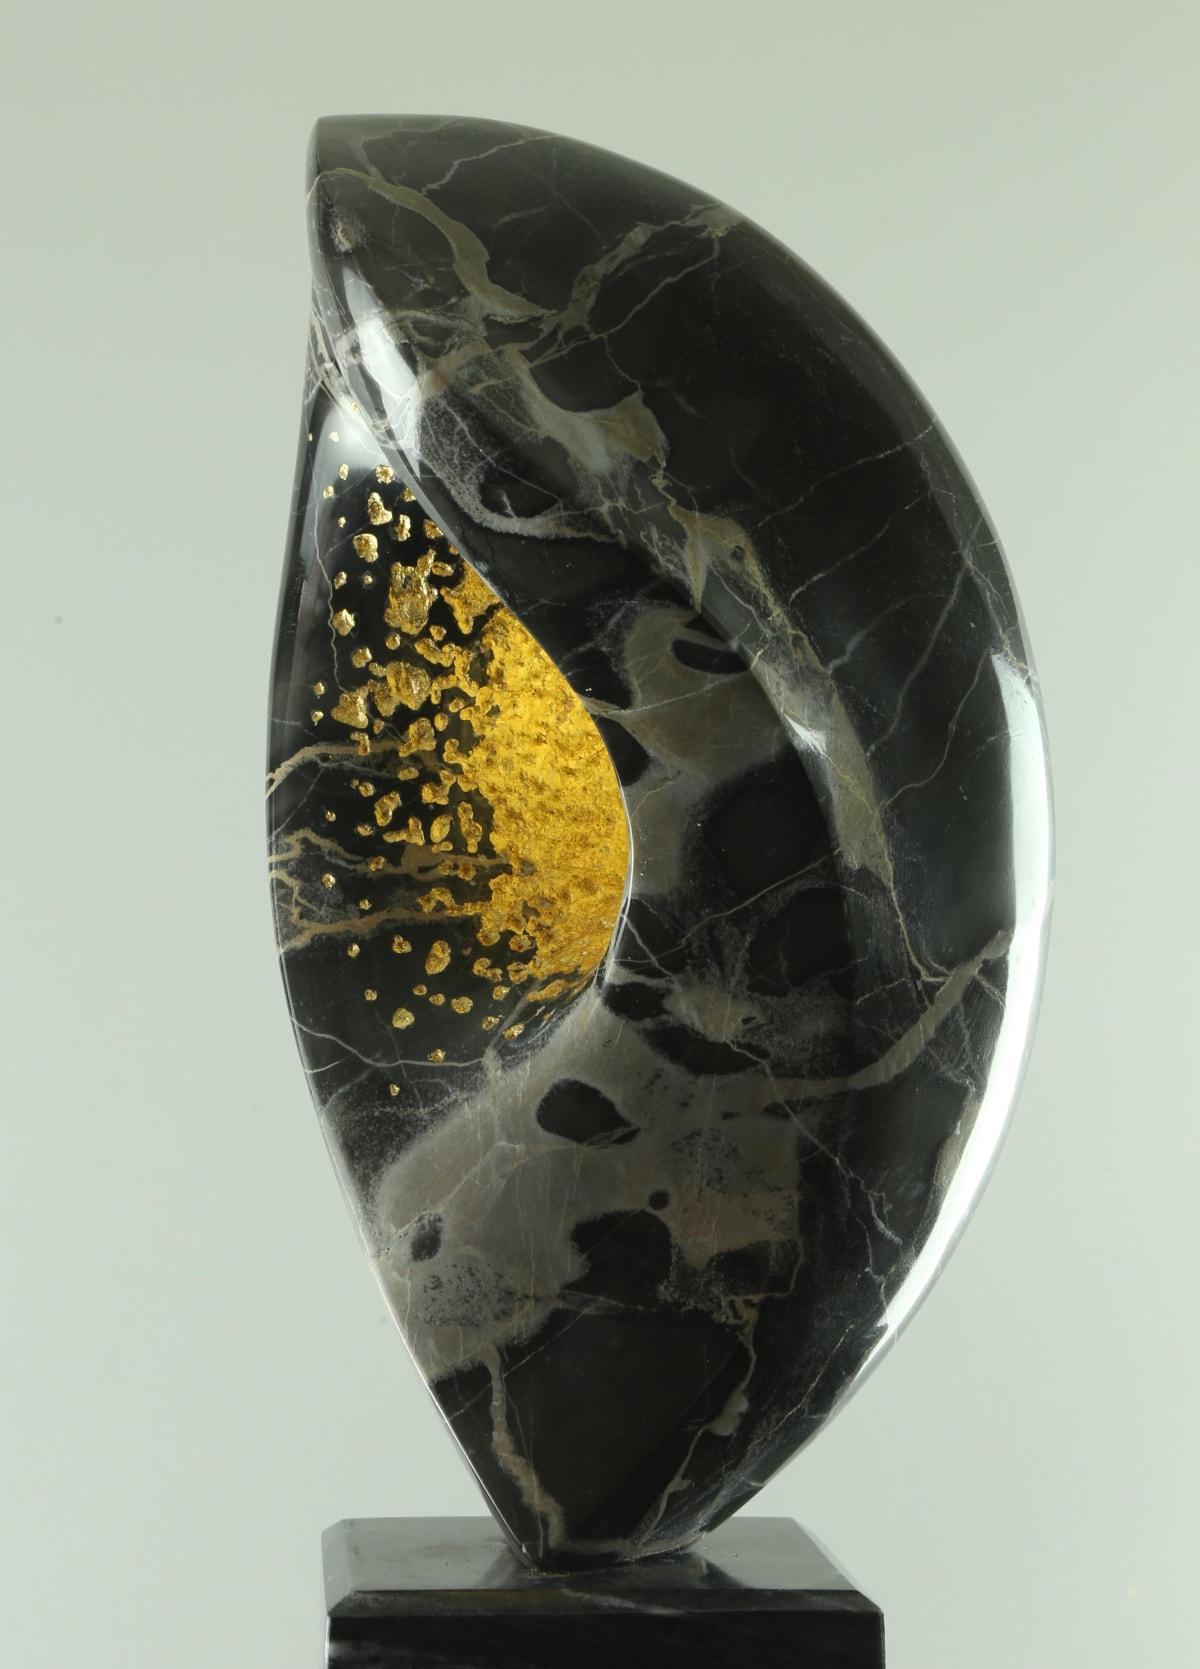 Michael Thacker Swift, 2018 Stone Sculpture 29 x 13 x 10 cm 11 3/8 x 5 1/8 x 4 in